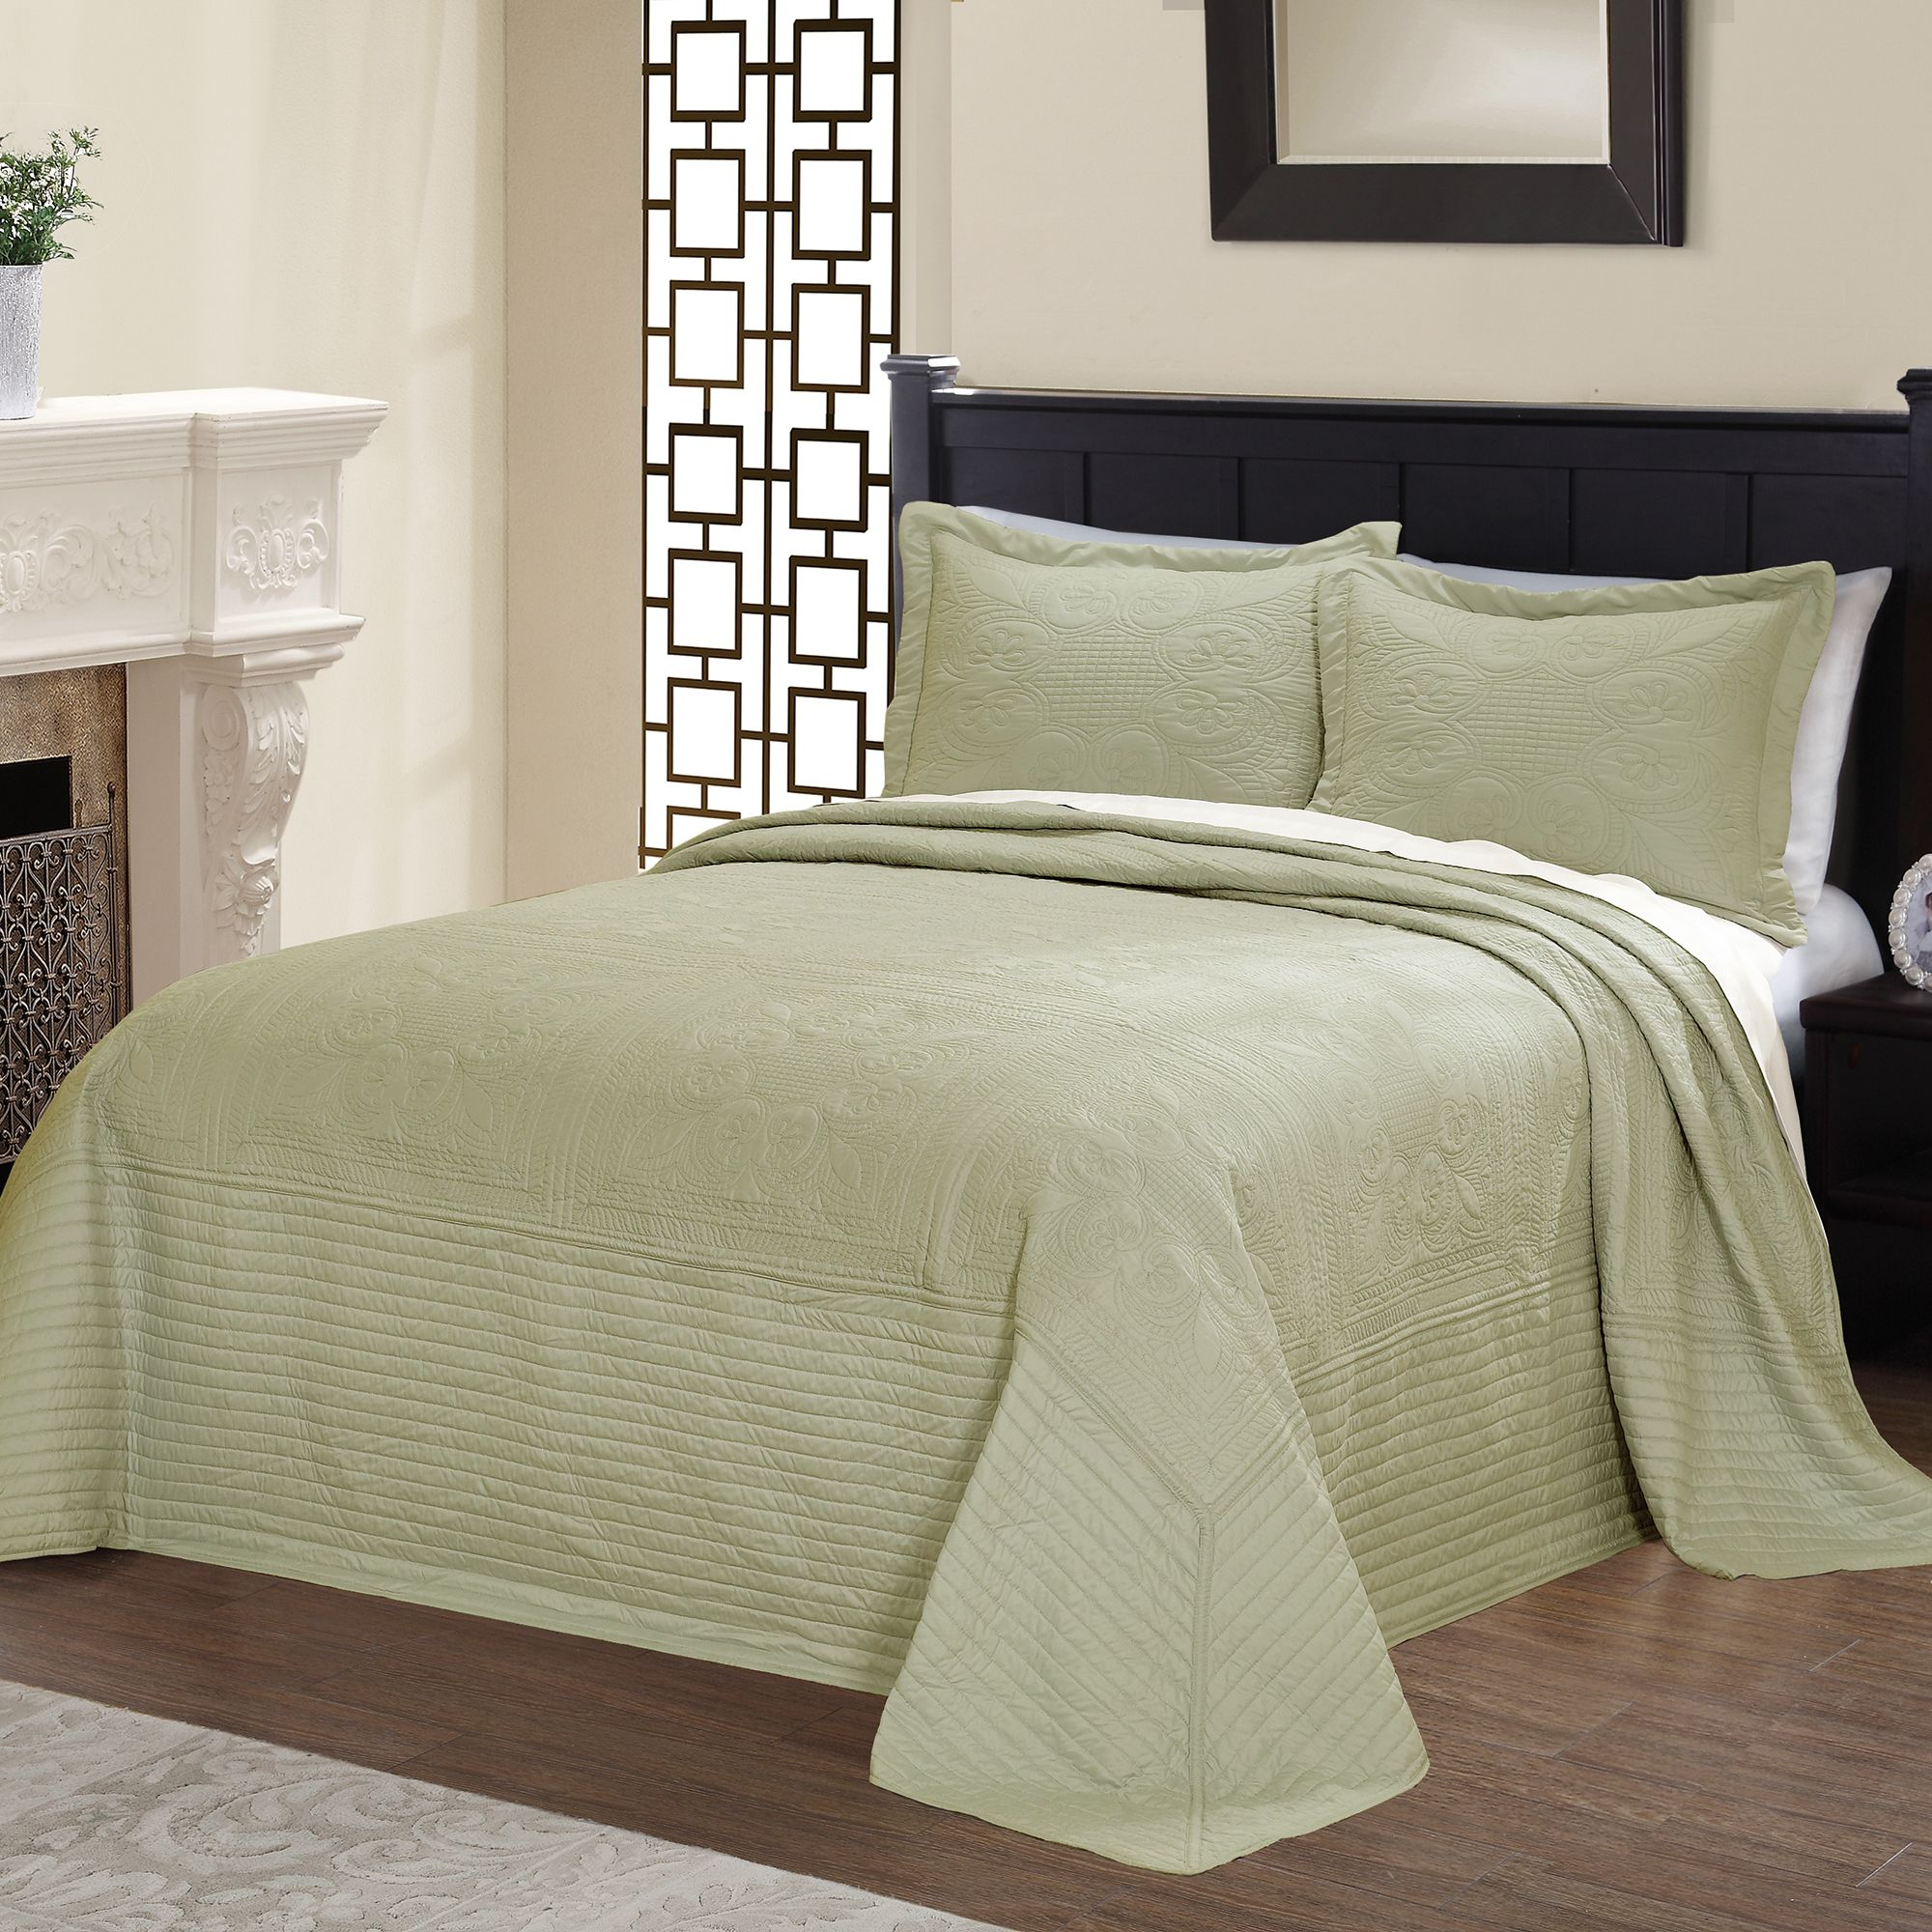 urban maize habitat bedding free product comforter pink bed cotton overstock bath com jacquard set